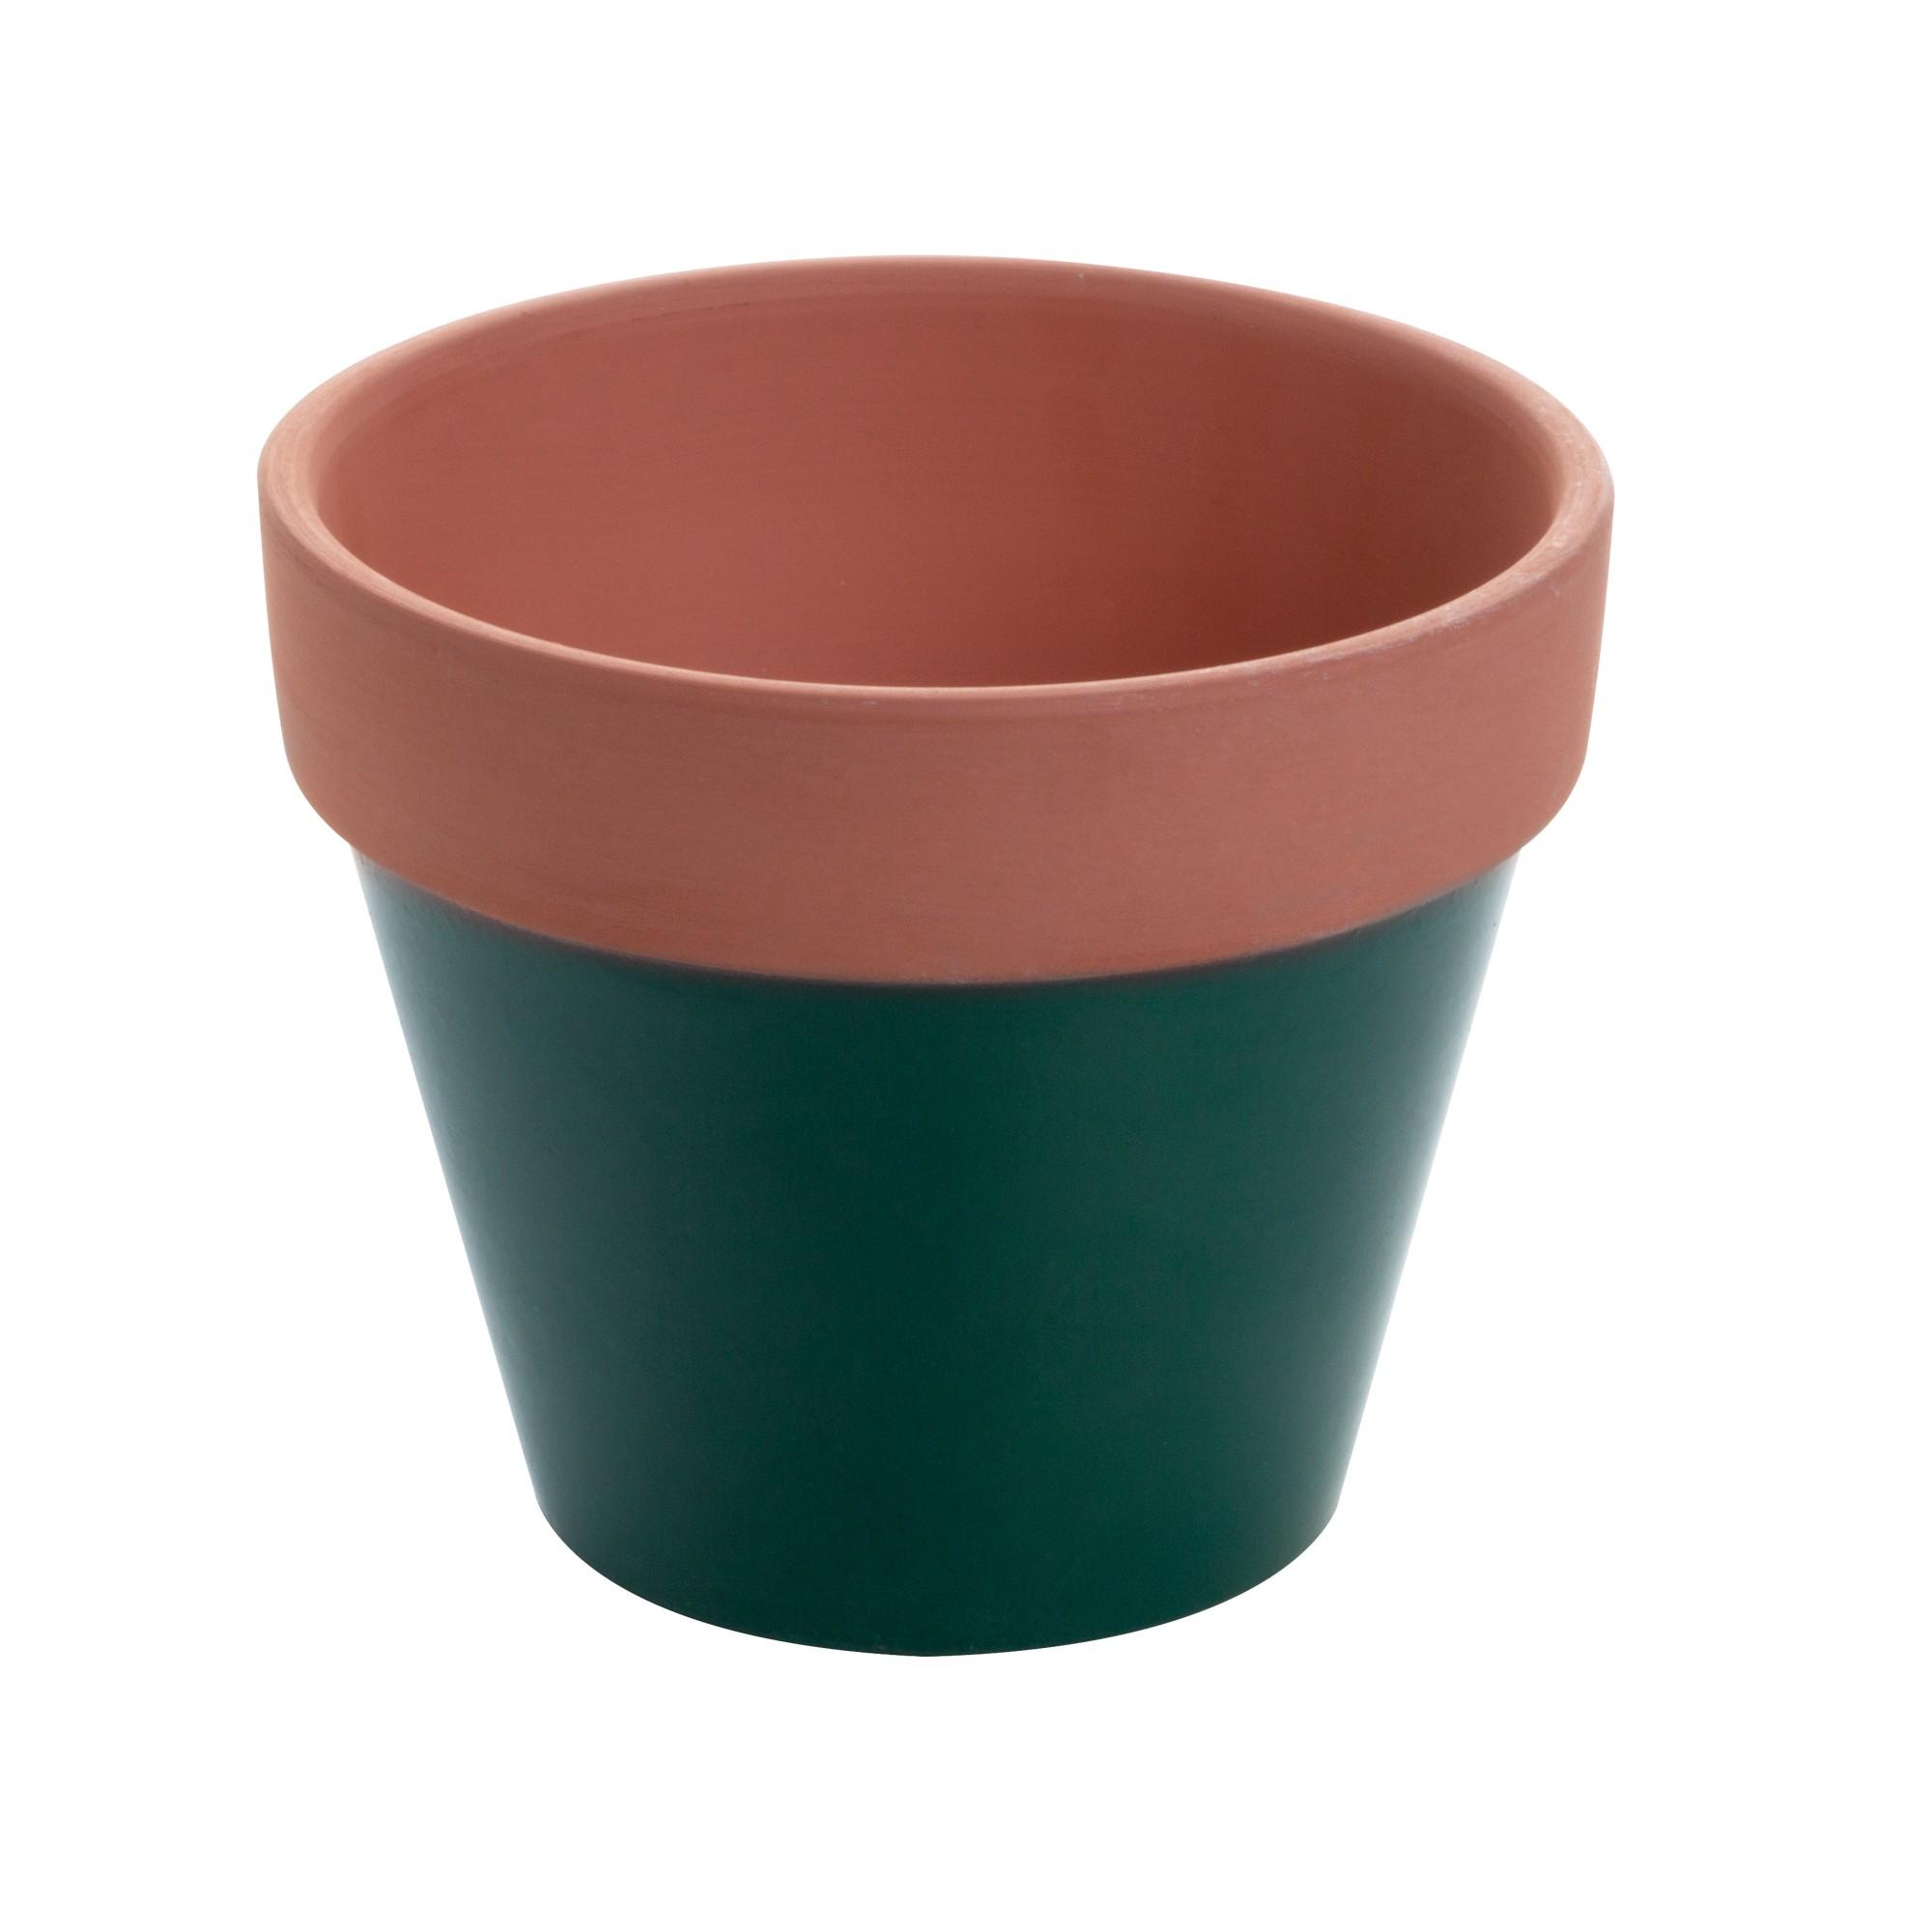 Vaso Decorativo de Concreto Redondo 13 cm - Urban